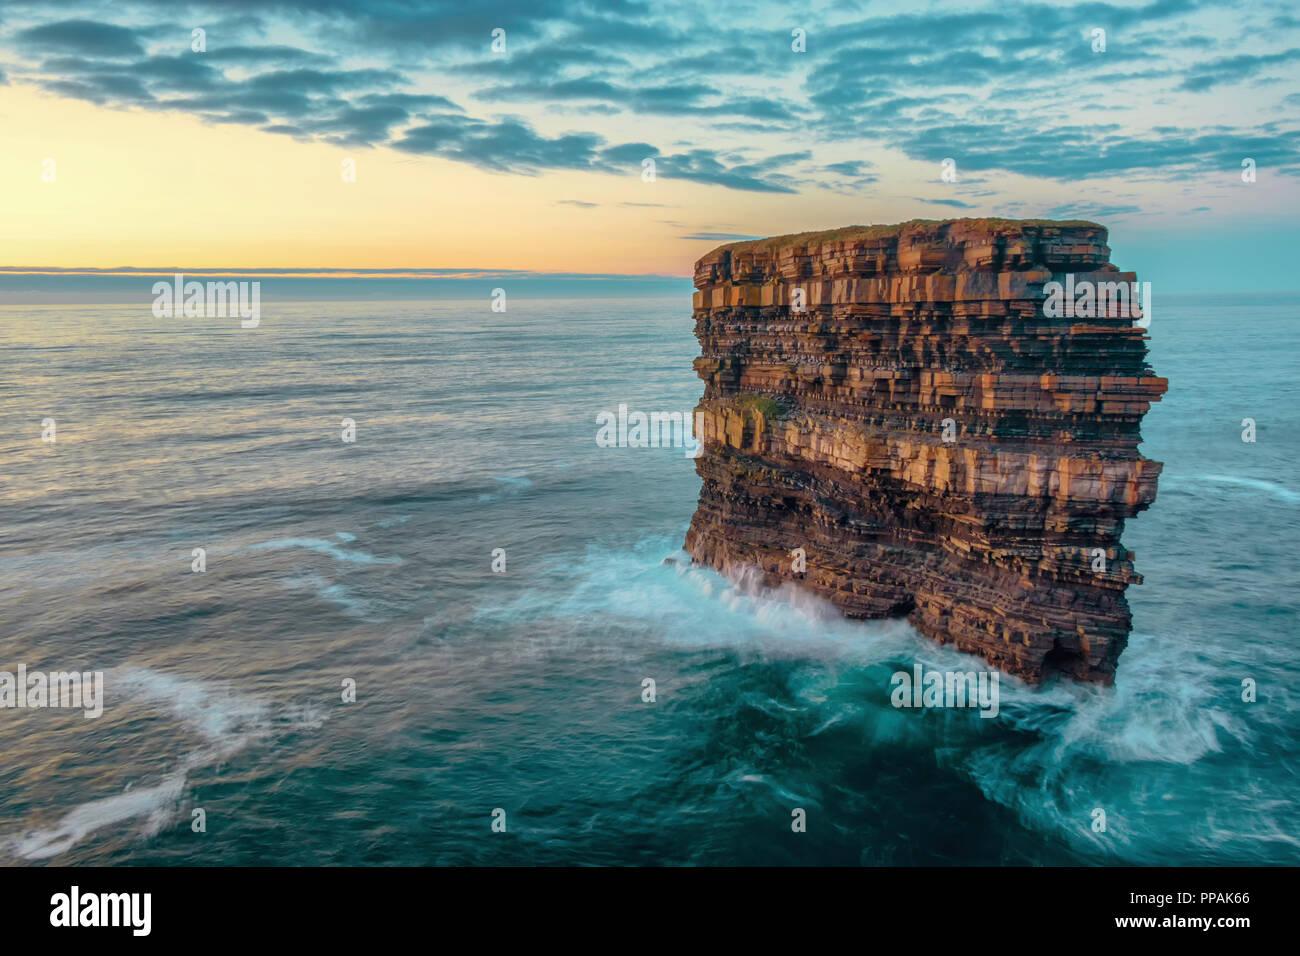 Downpatrick Head, Ballycastle, Co. Mayo, Ireland - Stock Image